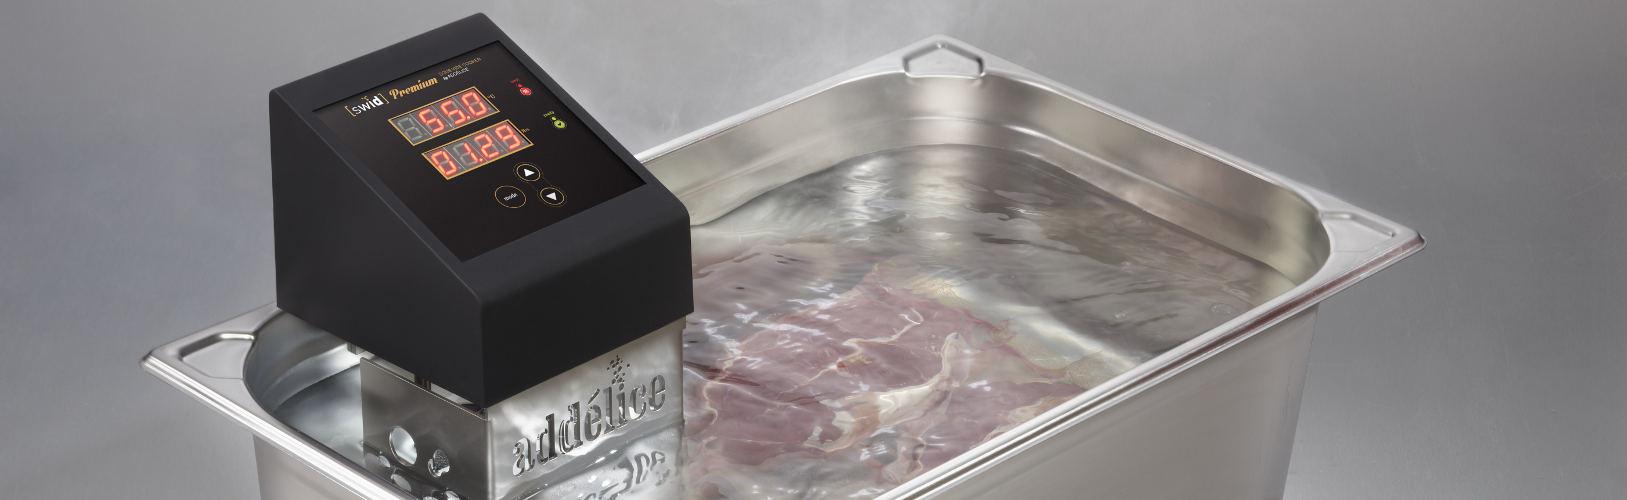 Thermoplongeur cuisson sous vide SWID Premium